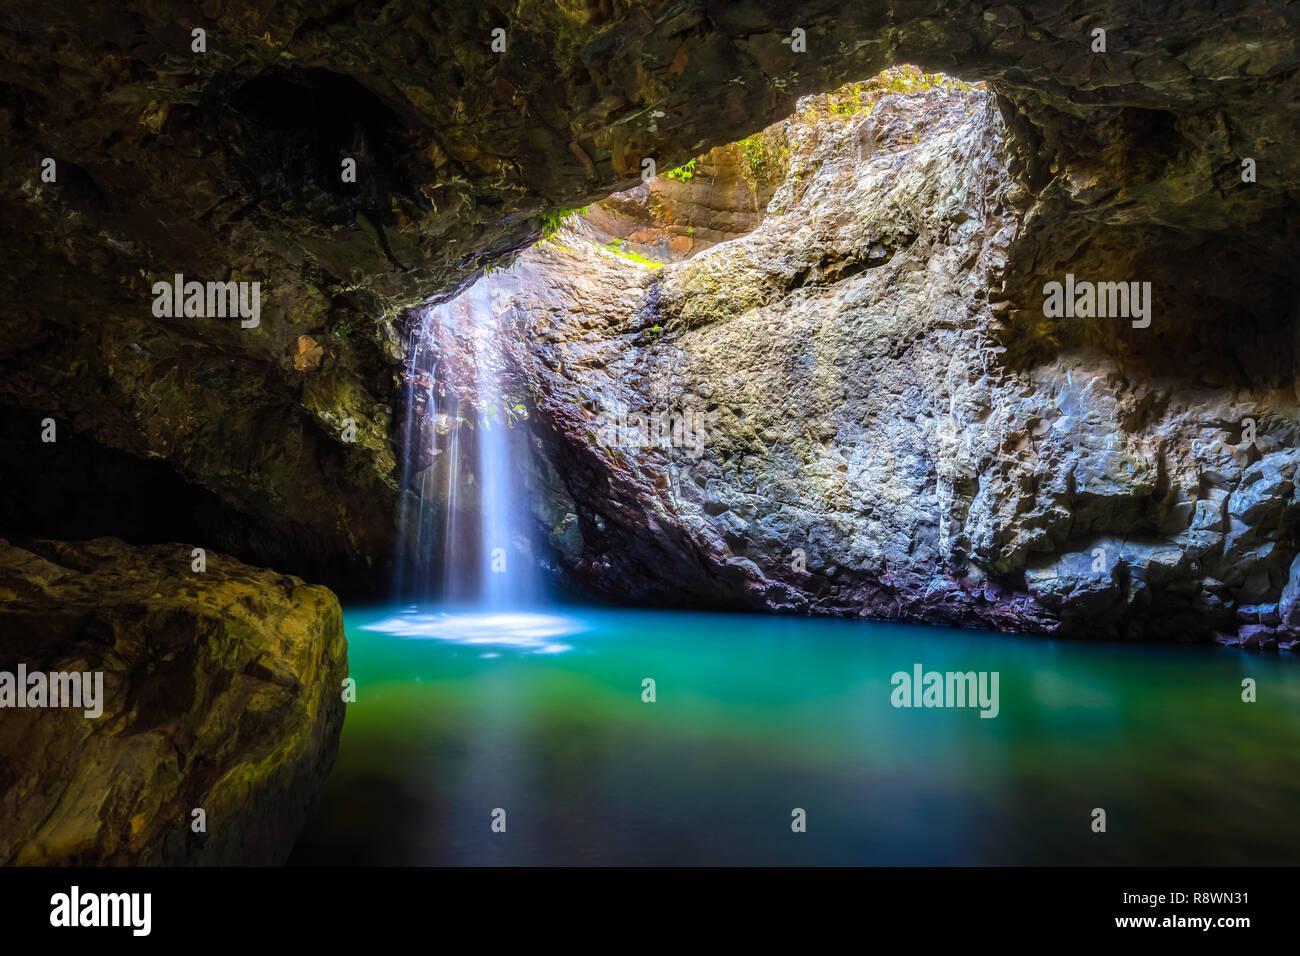 Grotte Cascade Photo Stock